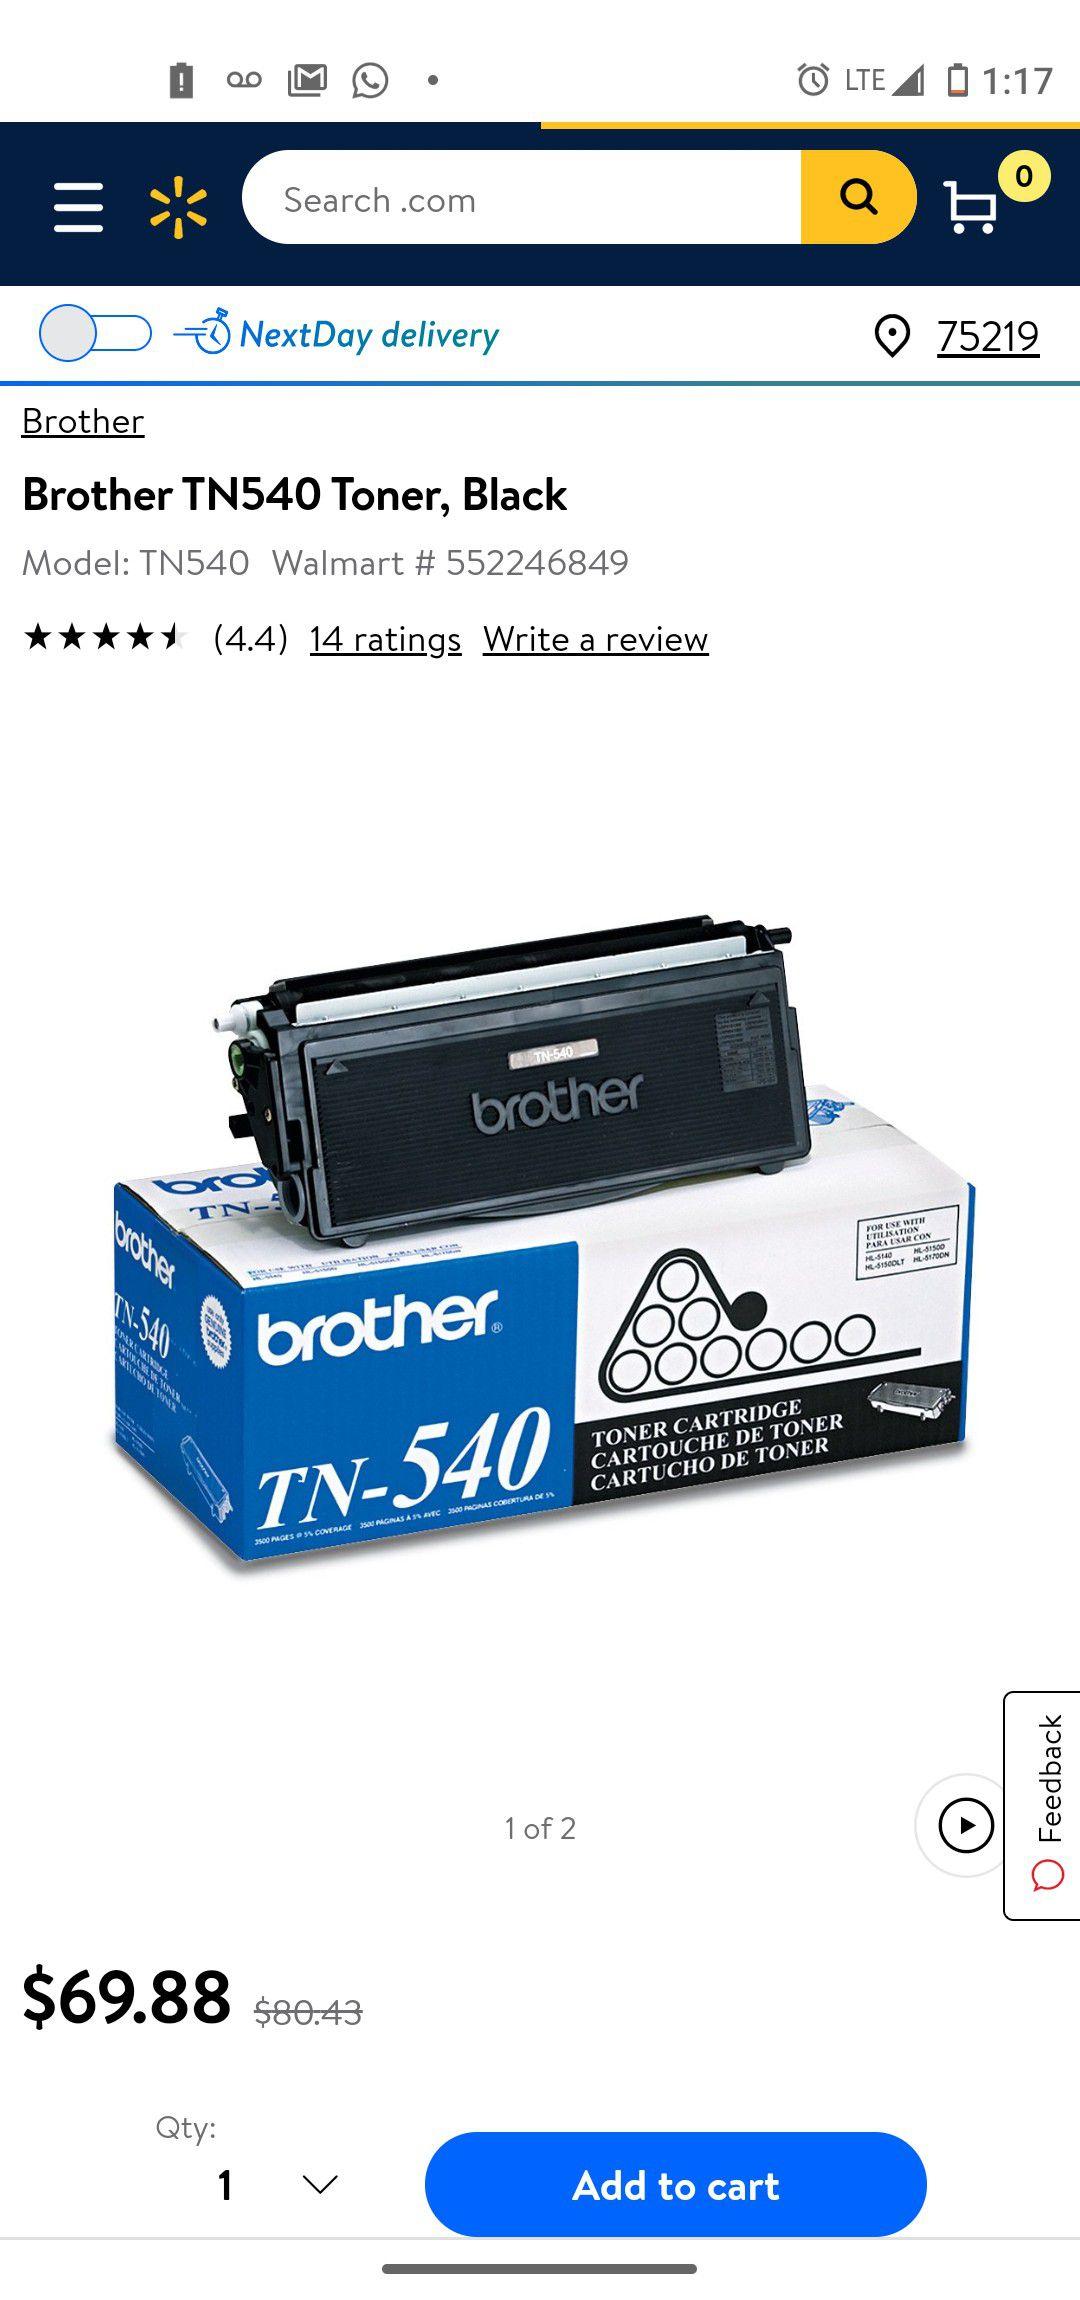 Brother TN 540 Black Toner Cartridge, Standard